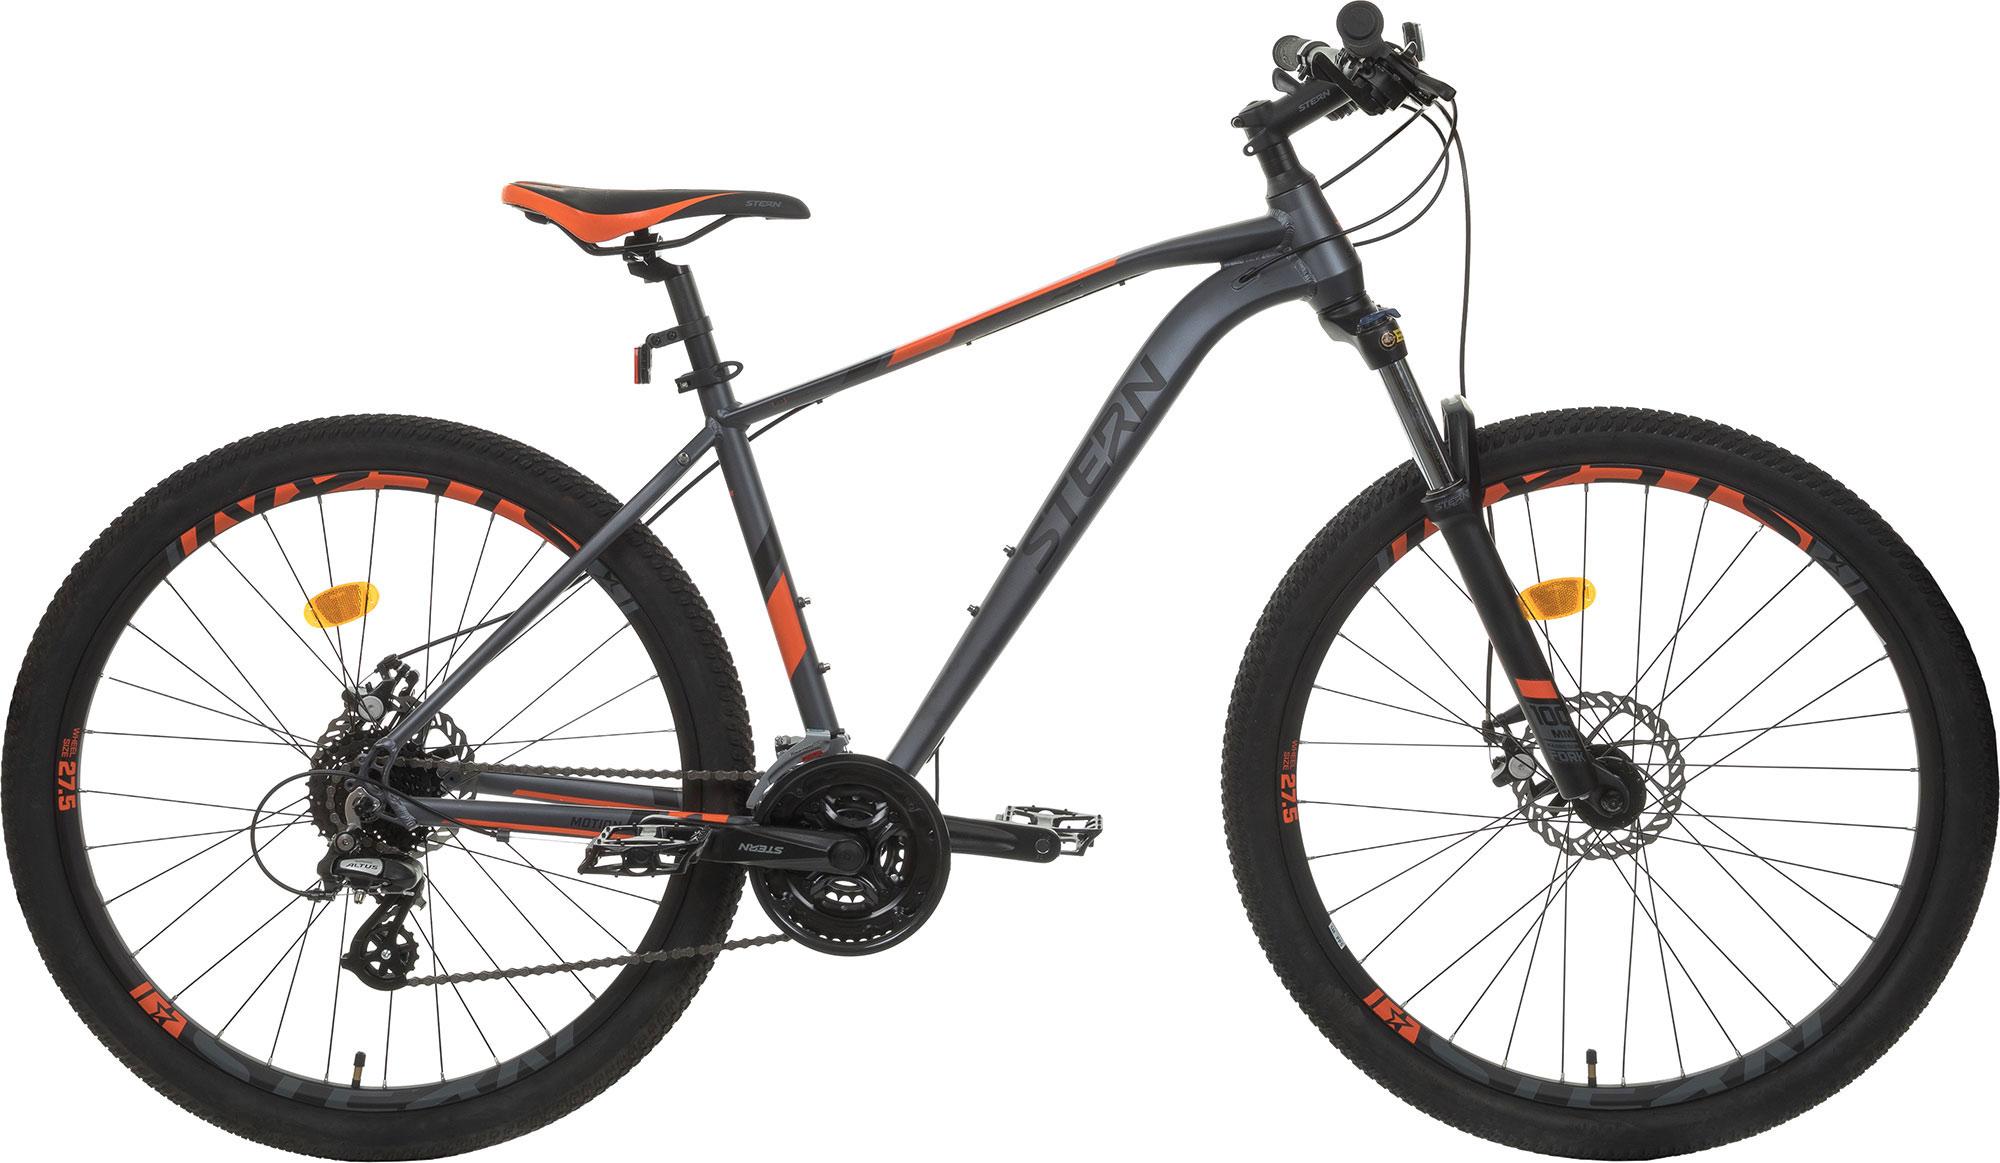 Stern Велосипед горный Motion 1.0 27,5